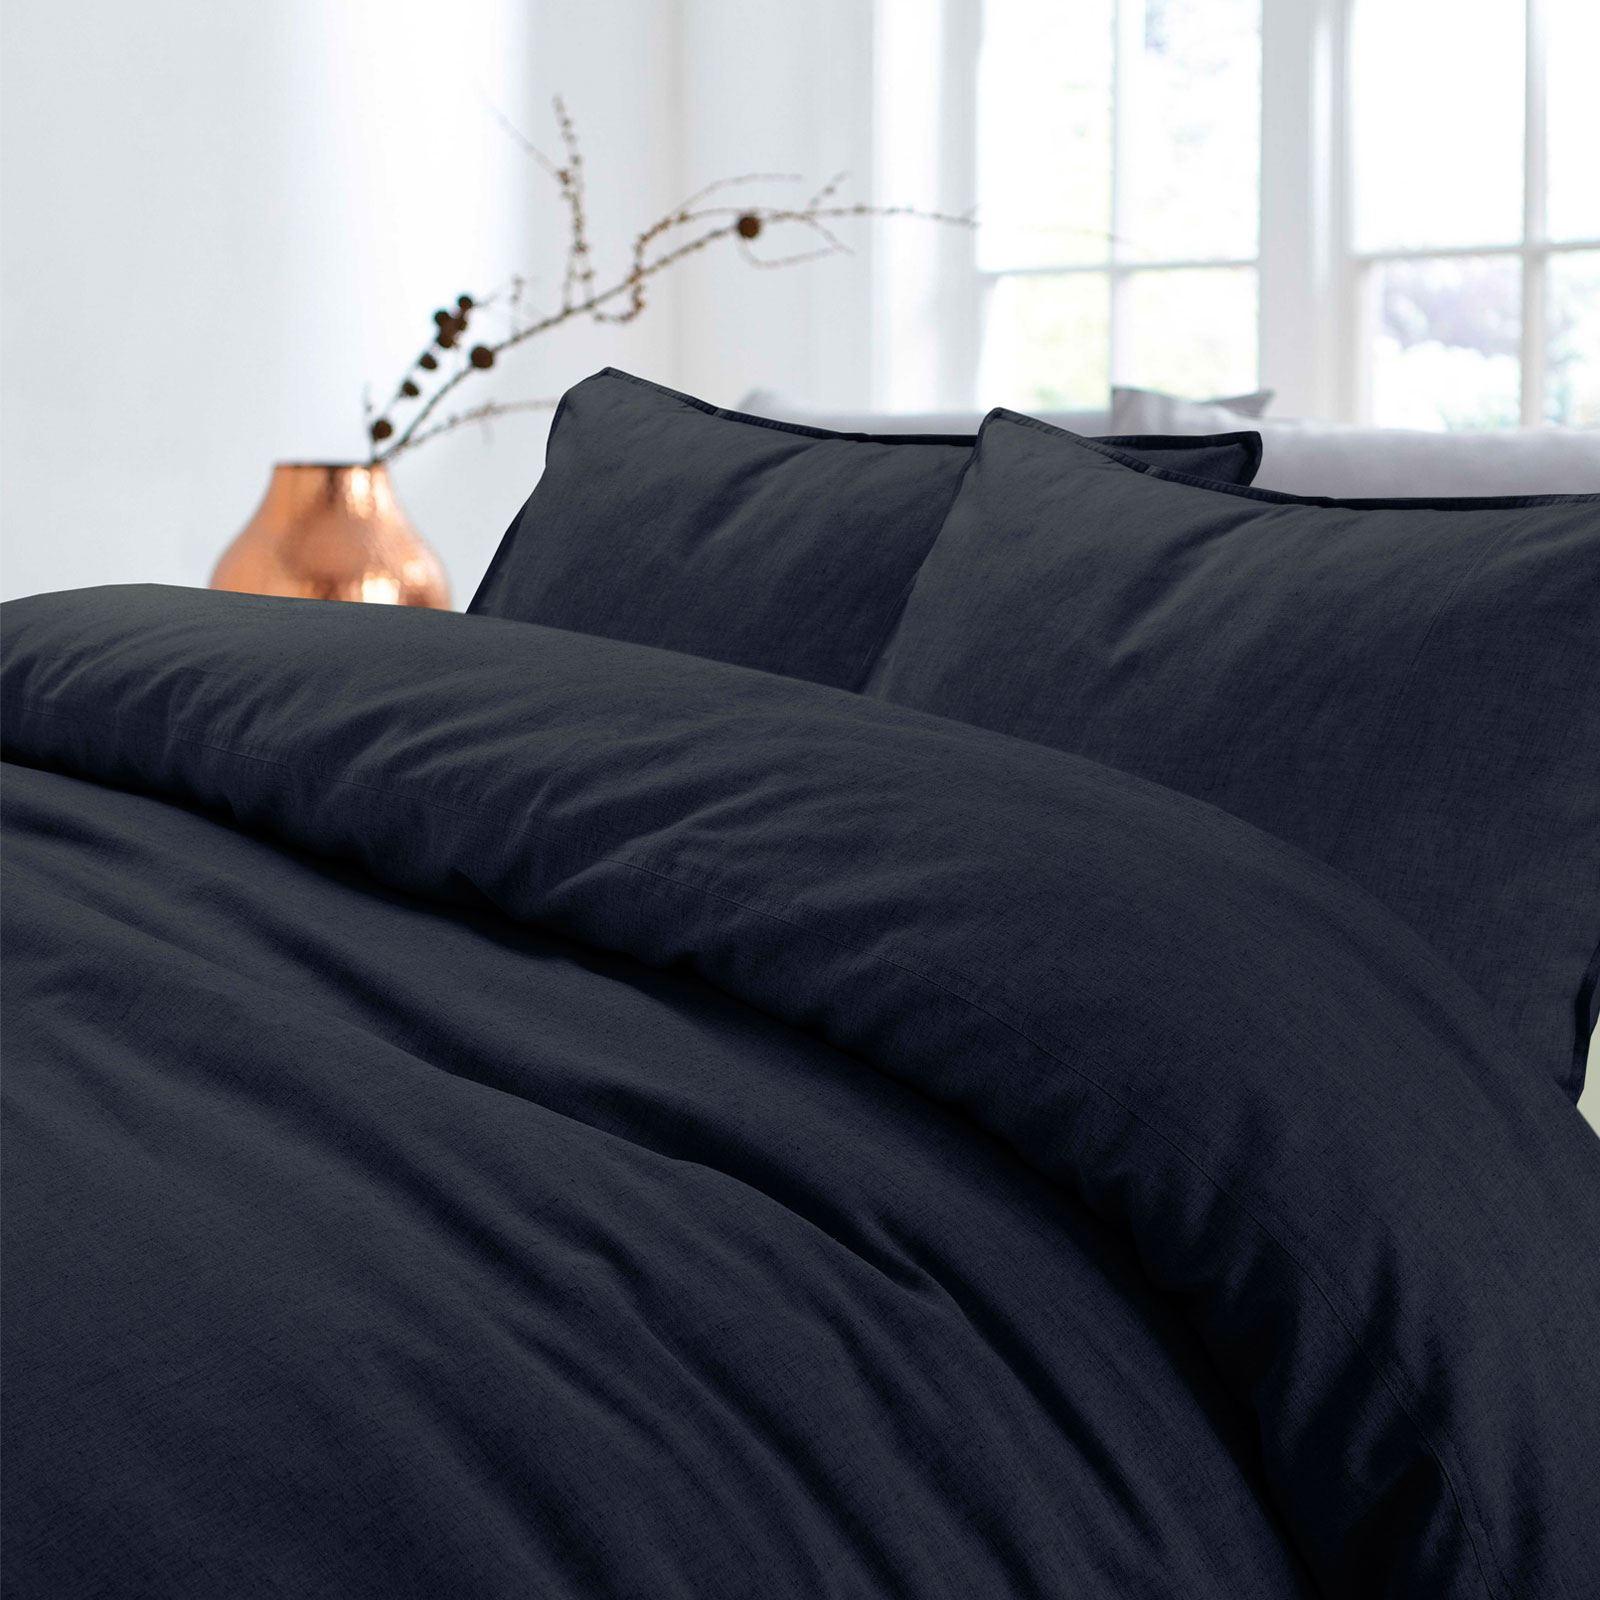 100-Cotton-Linen-Pure-Natural-Duvet-Cover-Bedding-Set-Double-King-Single thumbnail 24